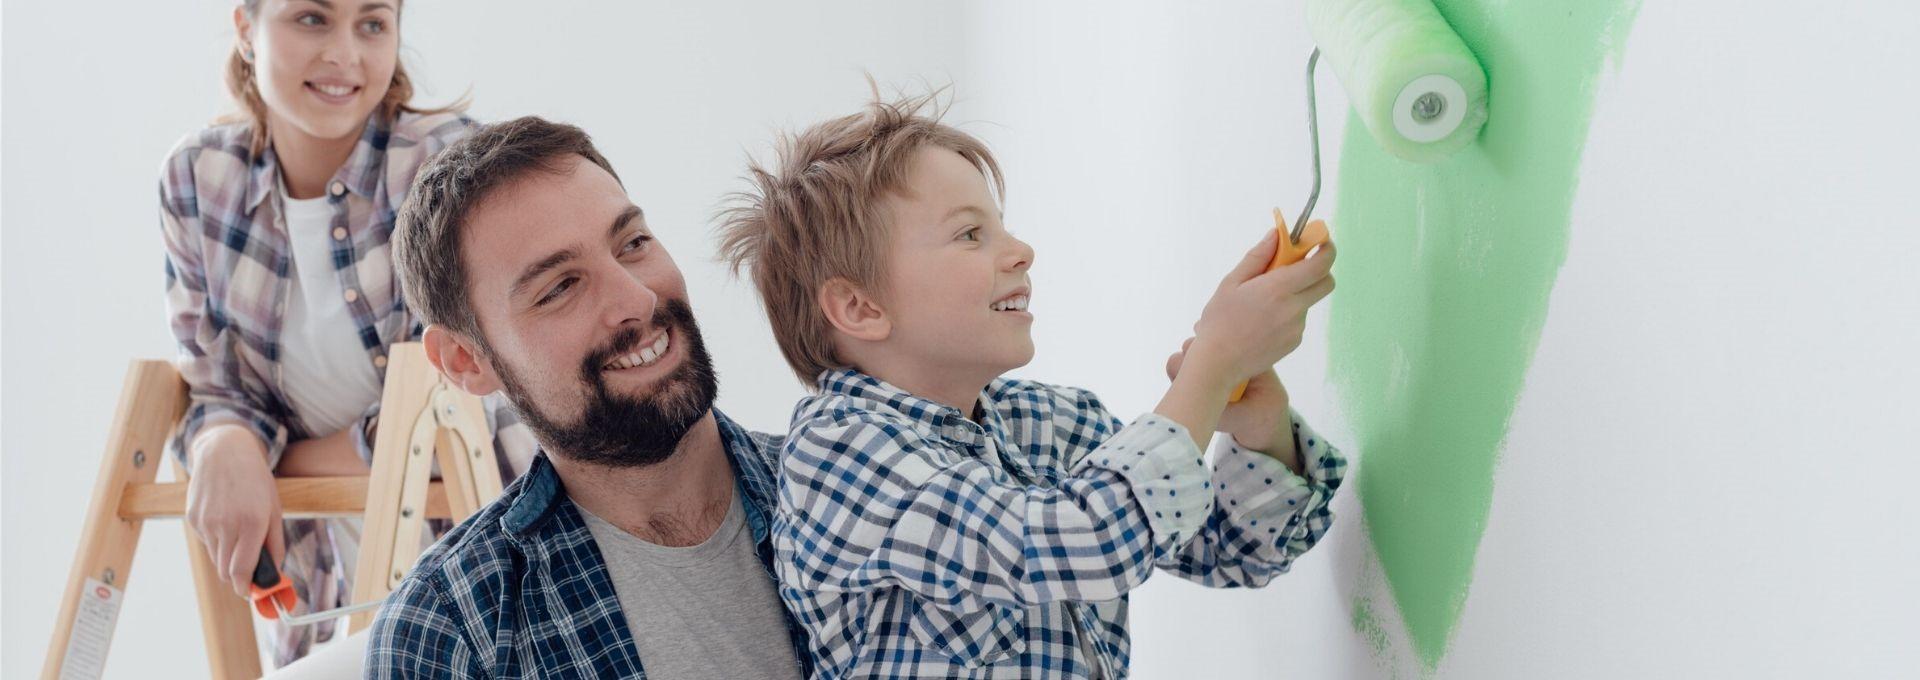 familia pintando